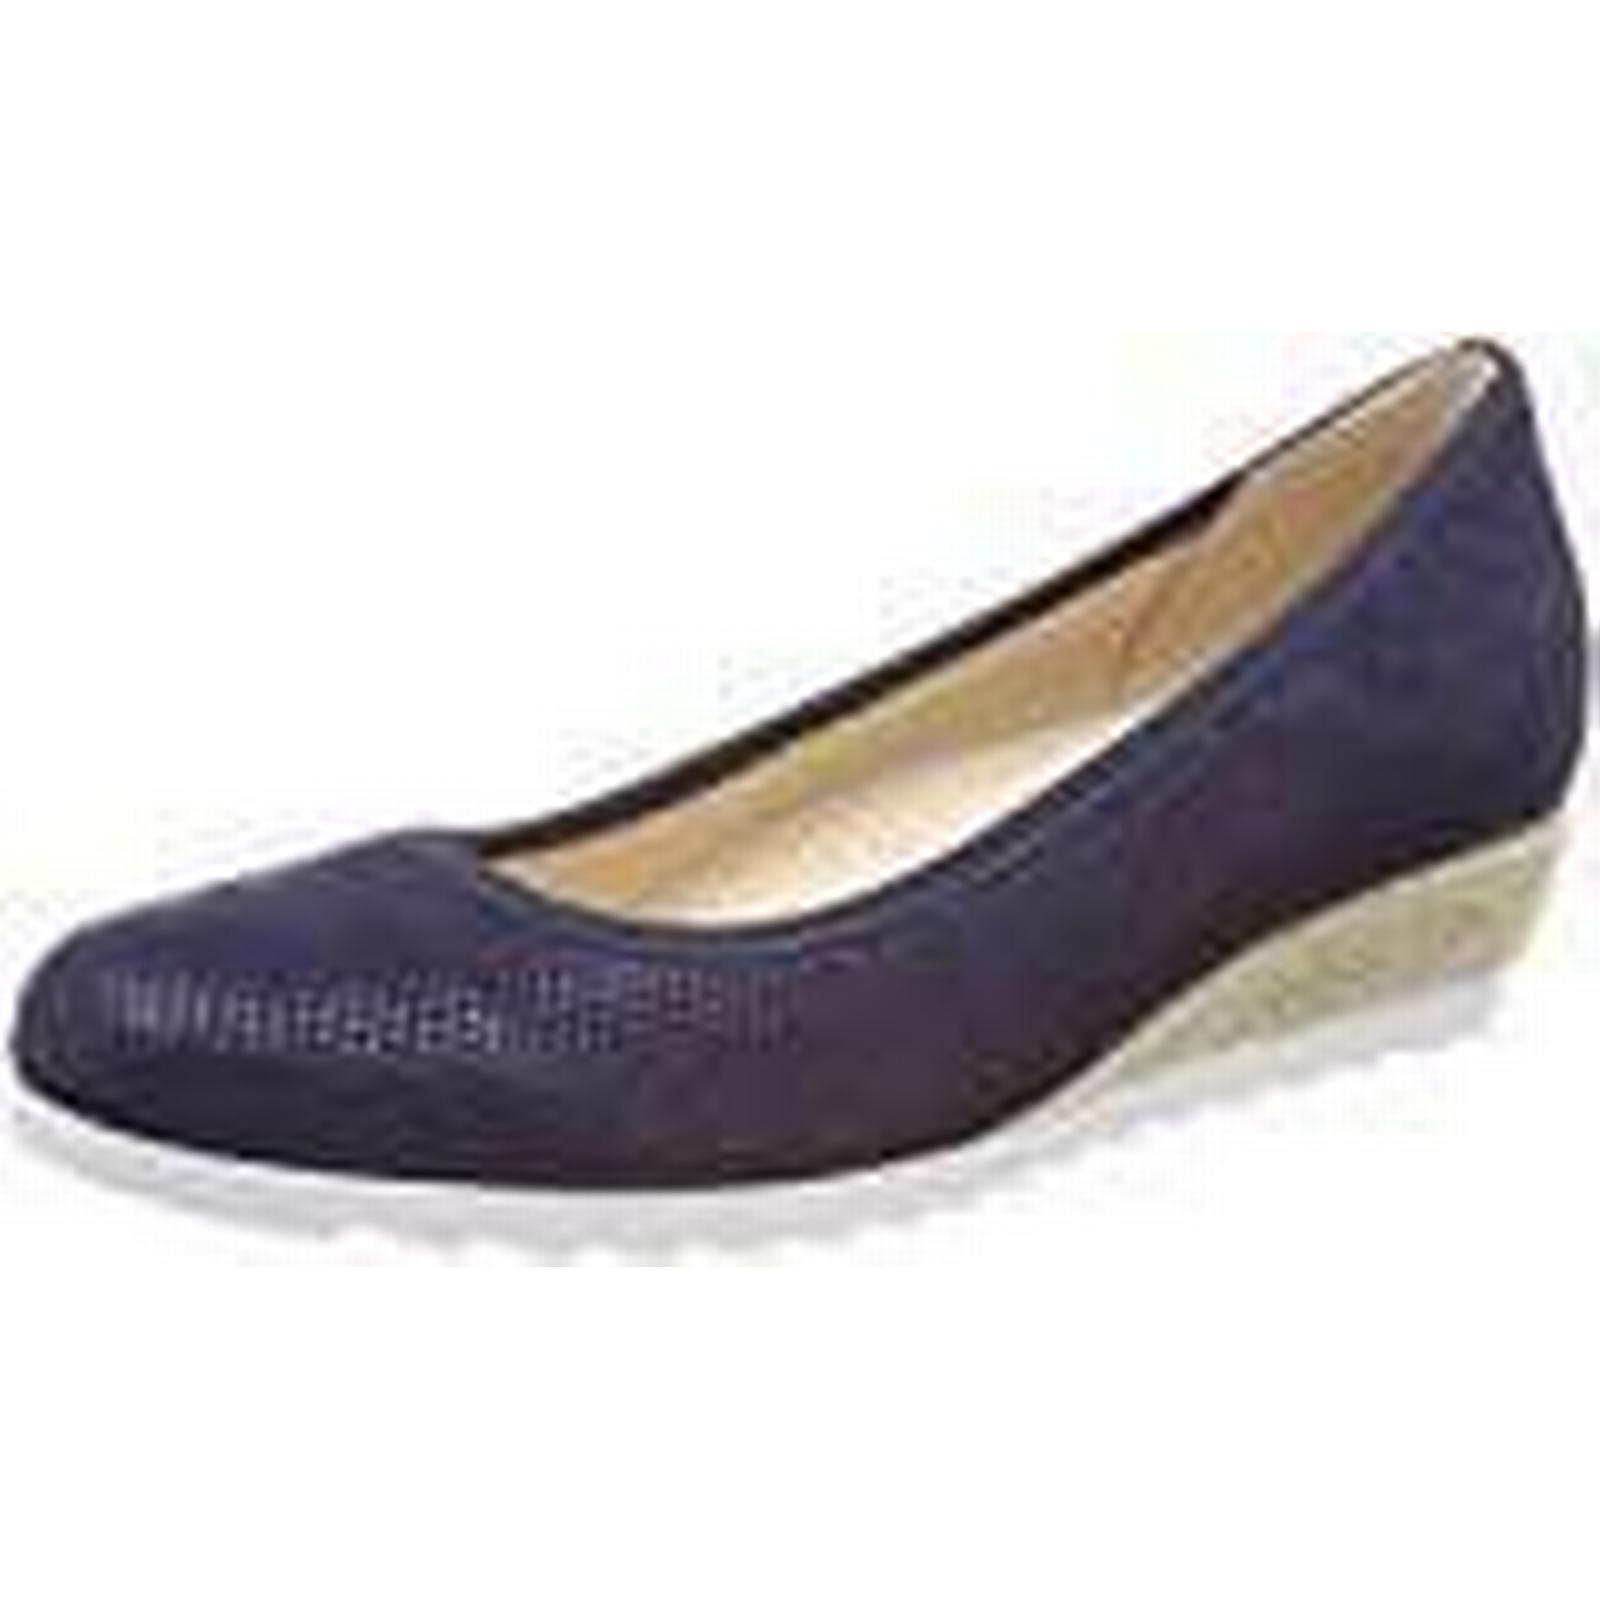 Gabor Women's Comfort-Sport Closed Toe 5 Ballet, Blau (Nightblue (Jute), 5 Toe UK 5 UK f2f91a